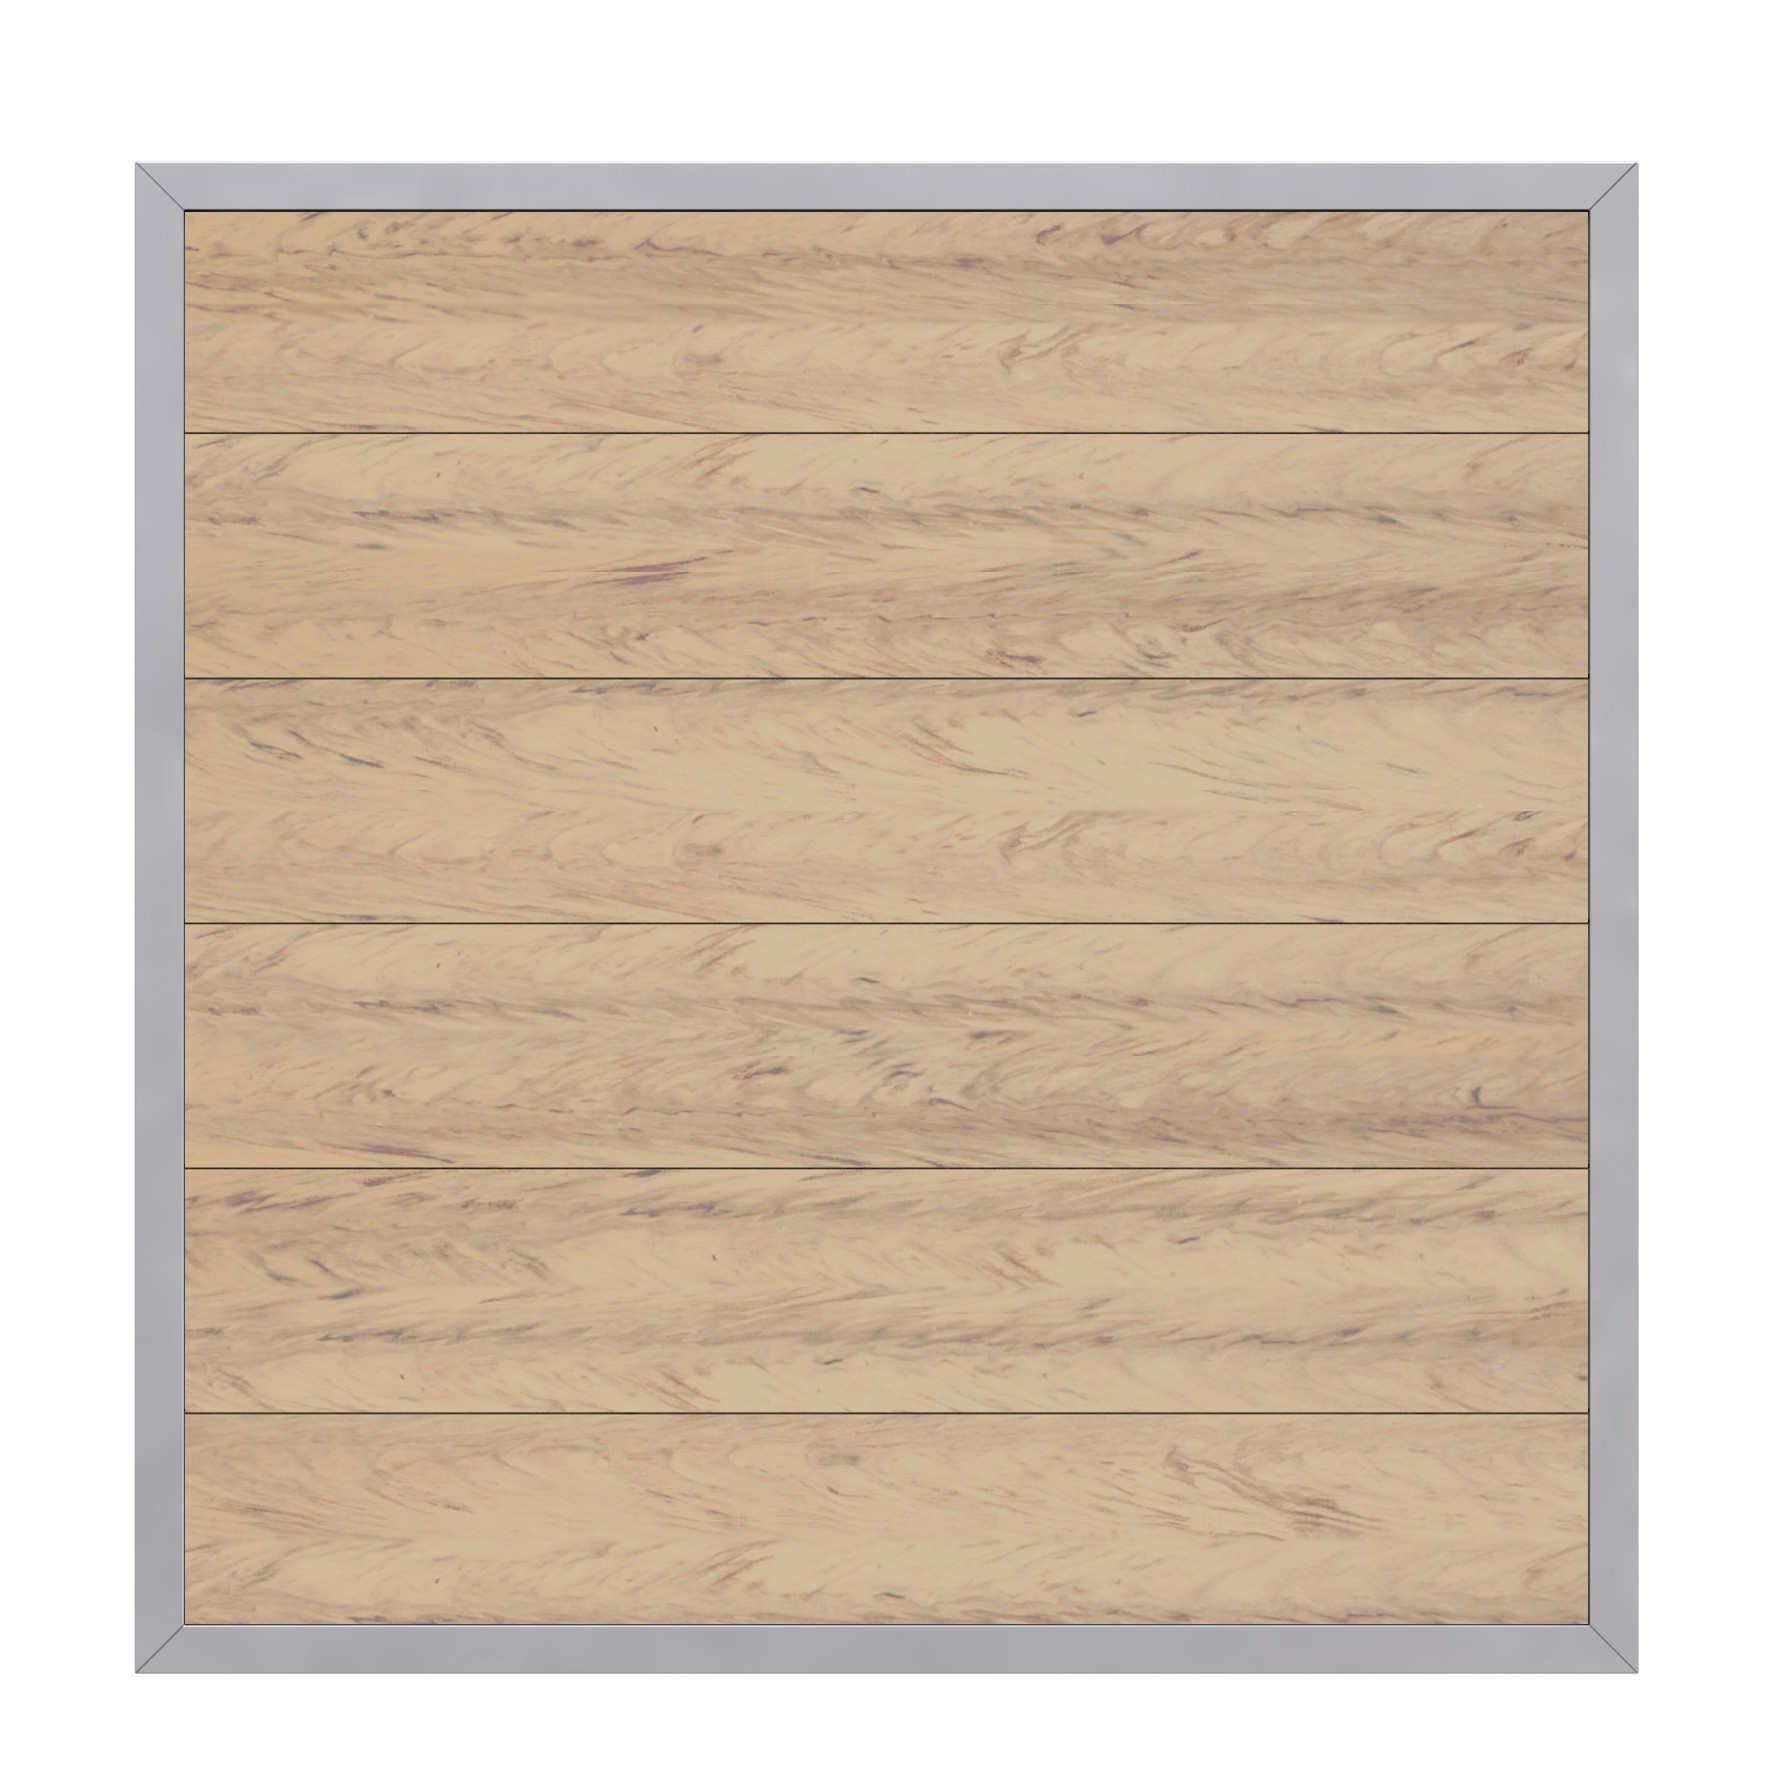 sichtschutzzaun design wpc alu sand 180x180cm bei. Black Bedroom Furniture Sets. Home Design Ideas